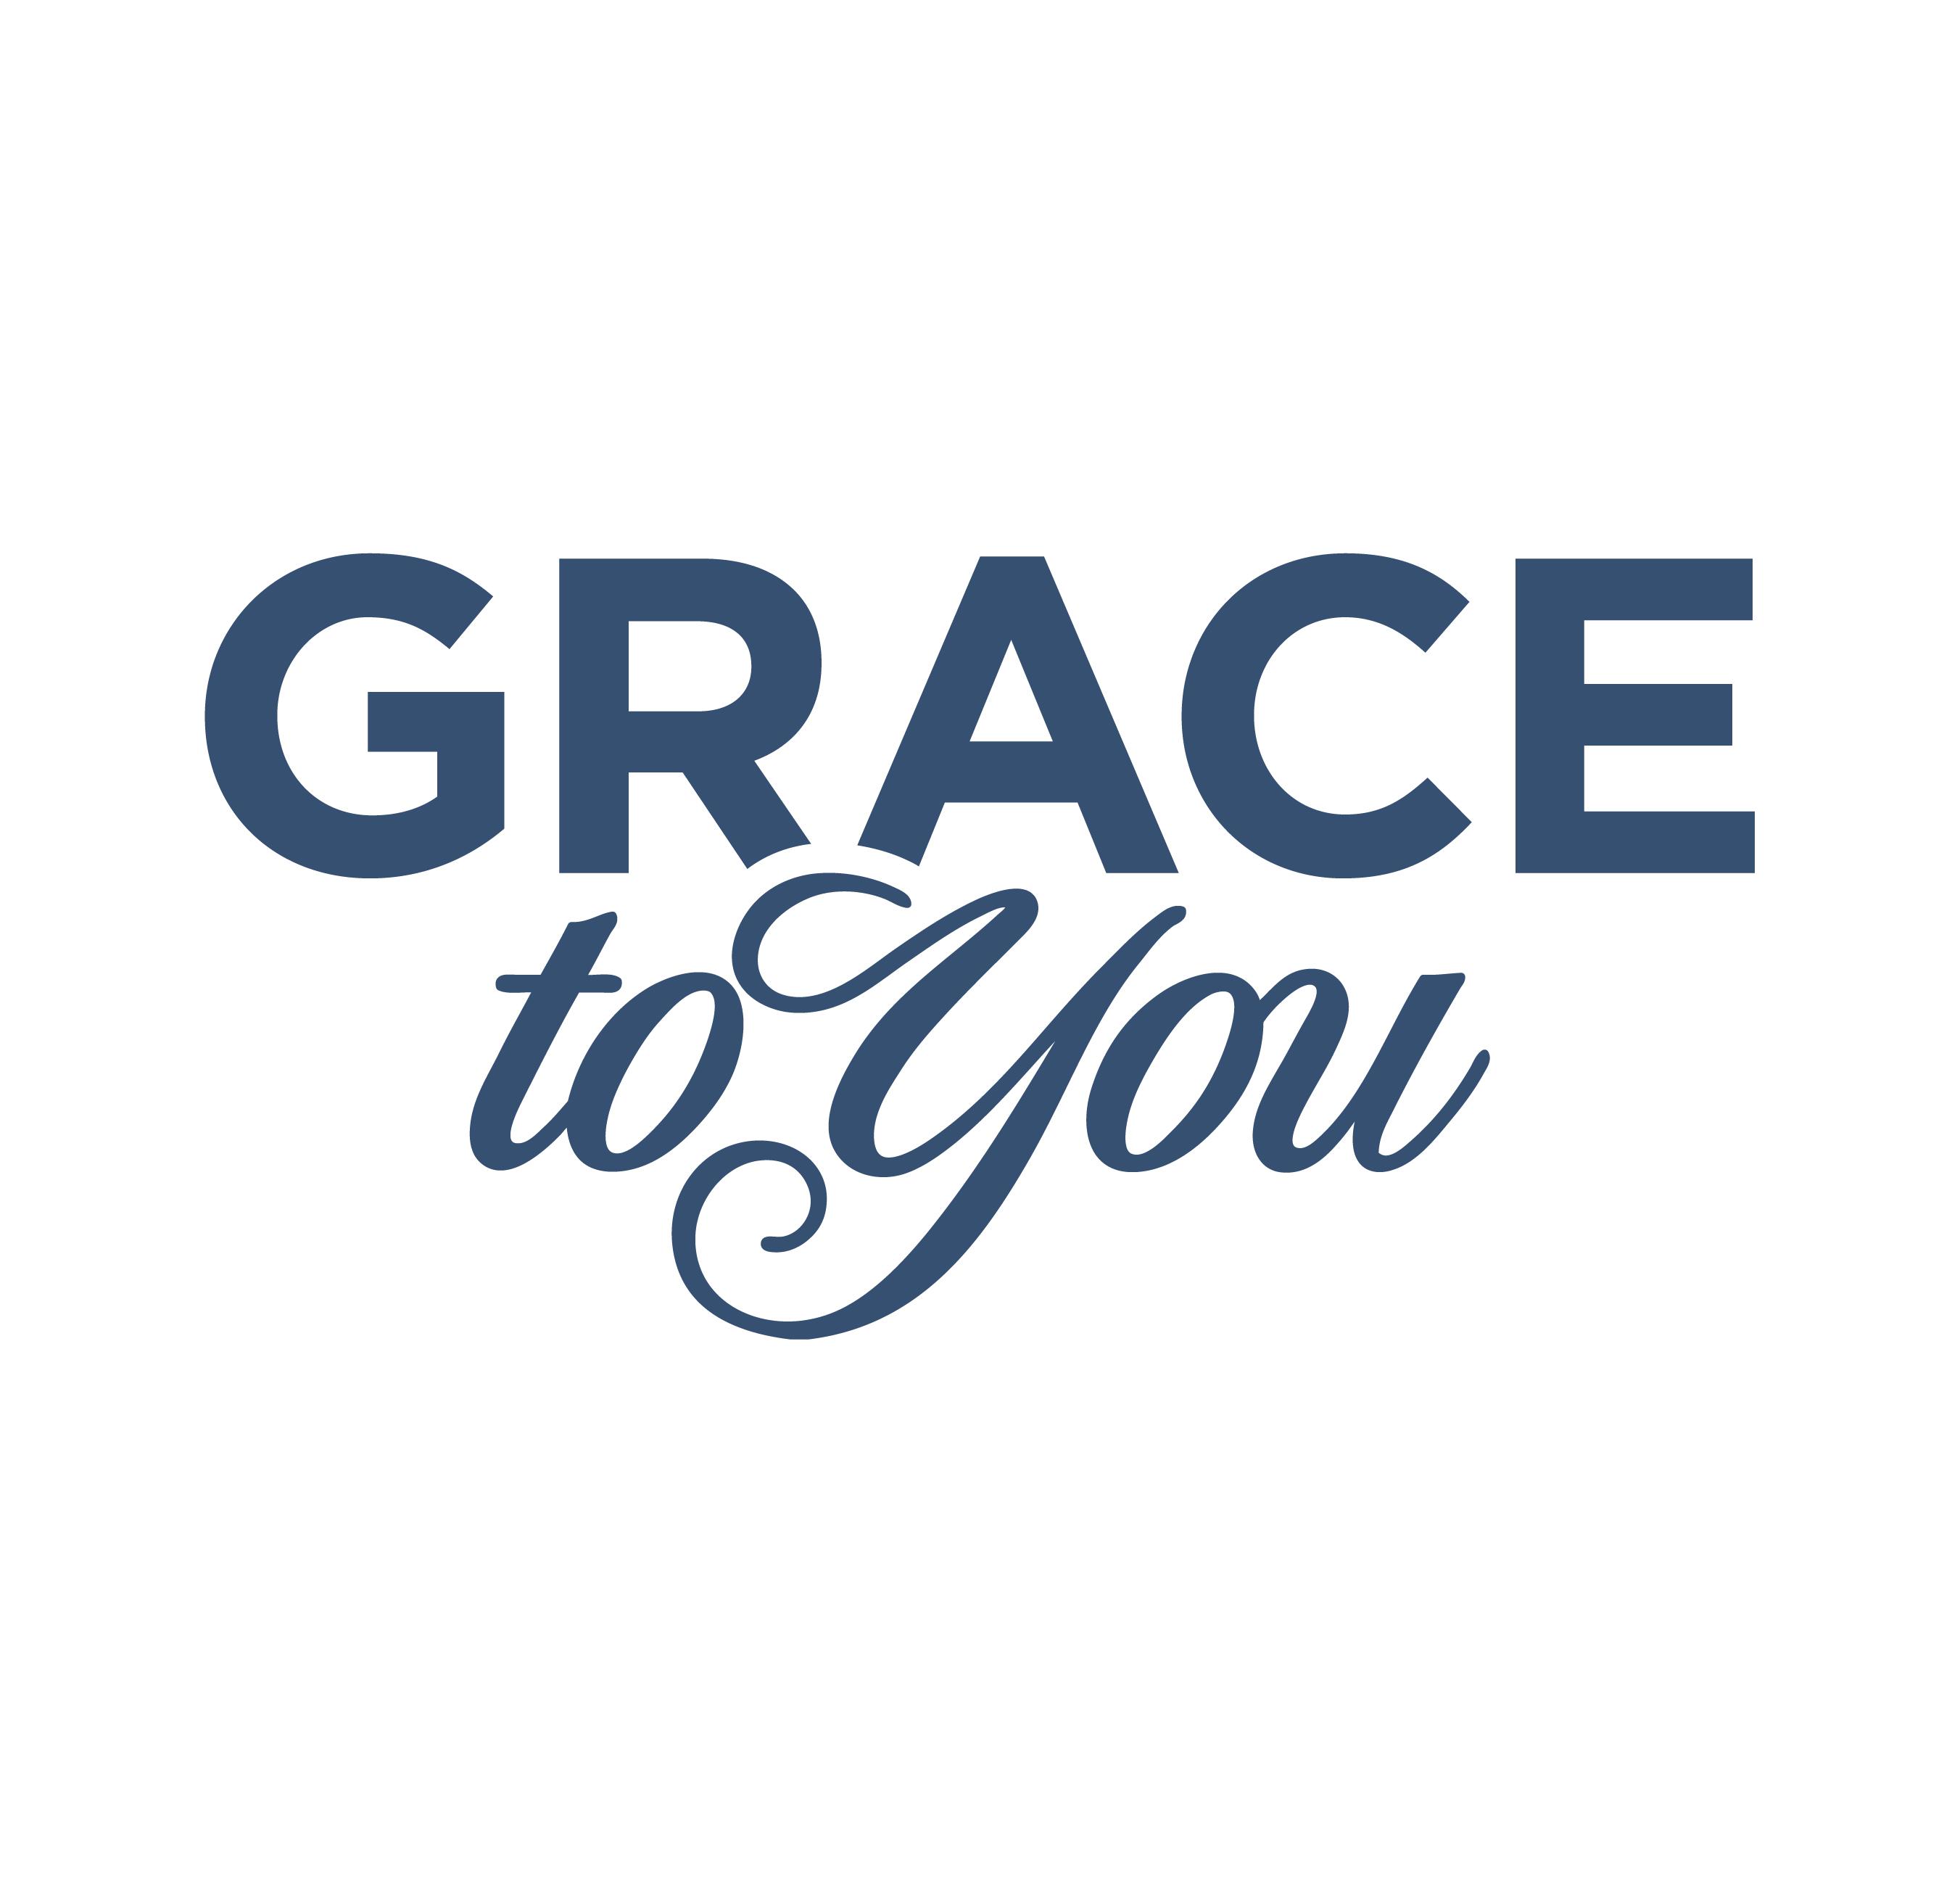 Grace to You; John MacArthur – Selecting the Proper Shoes